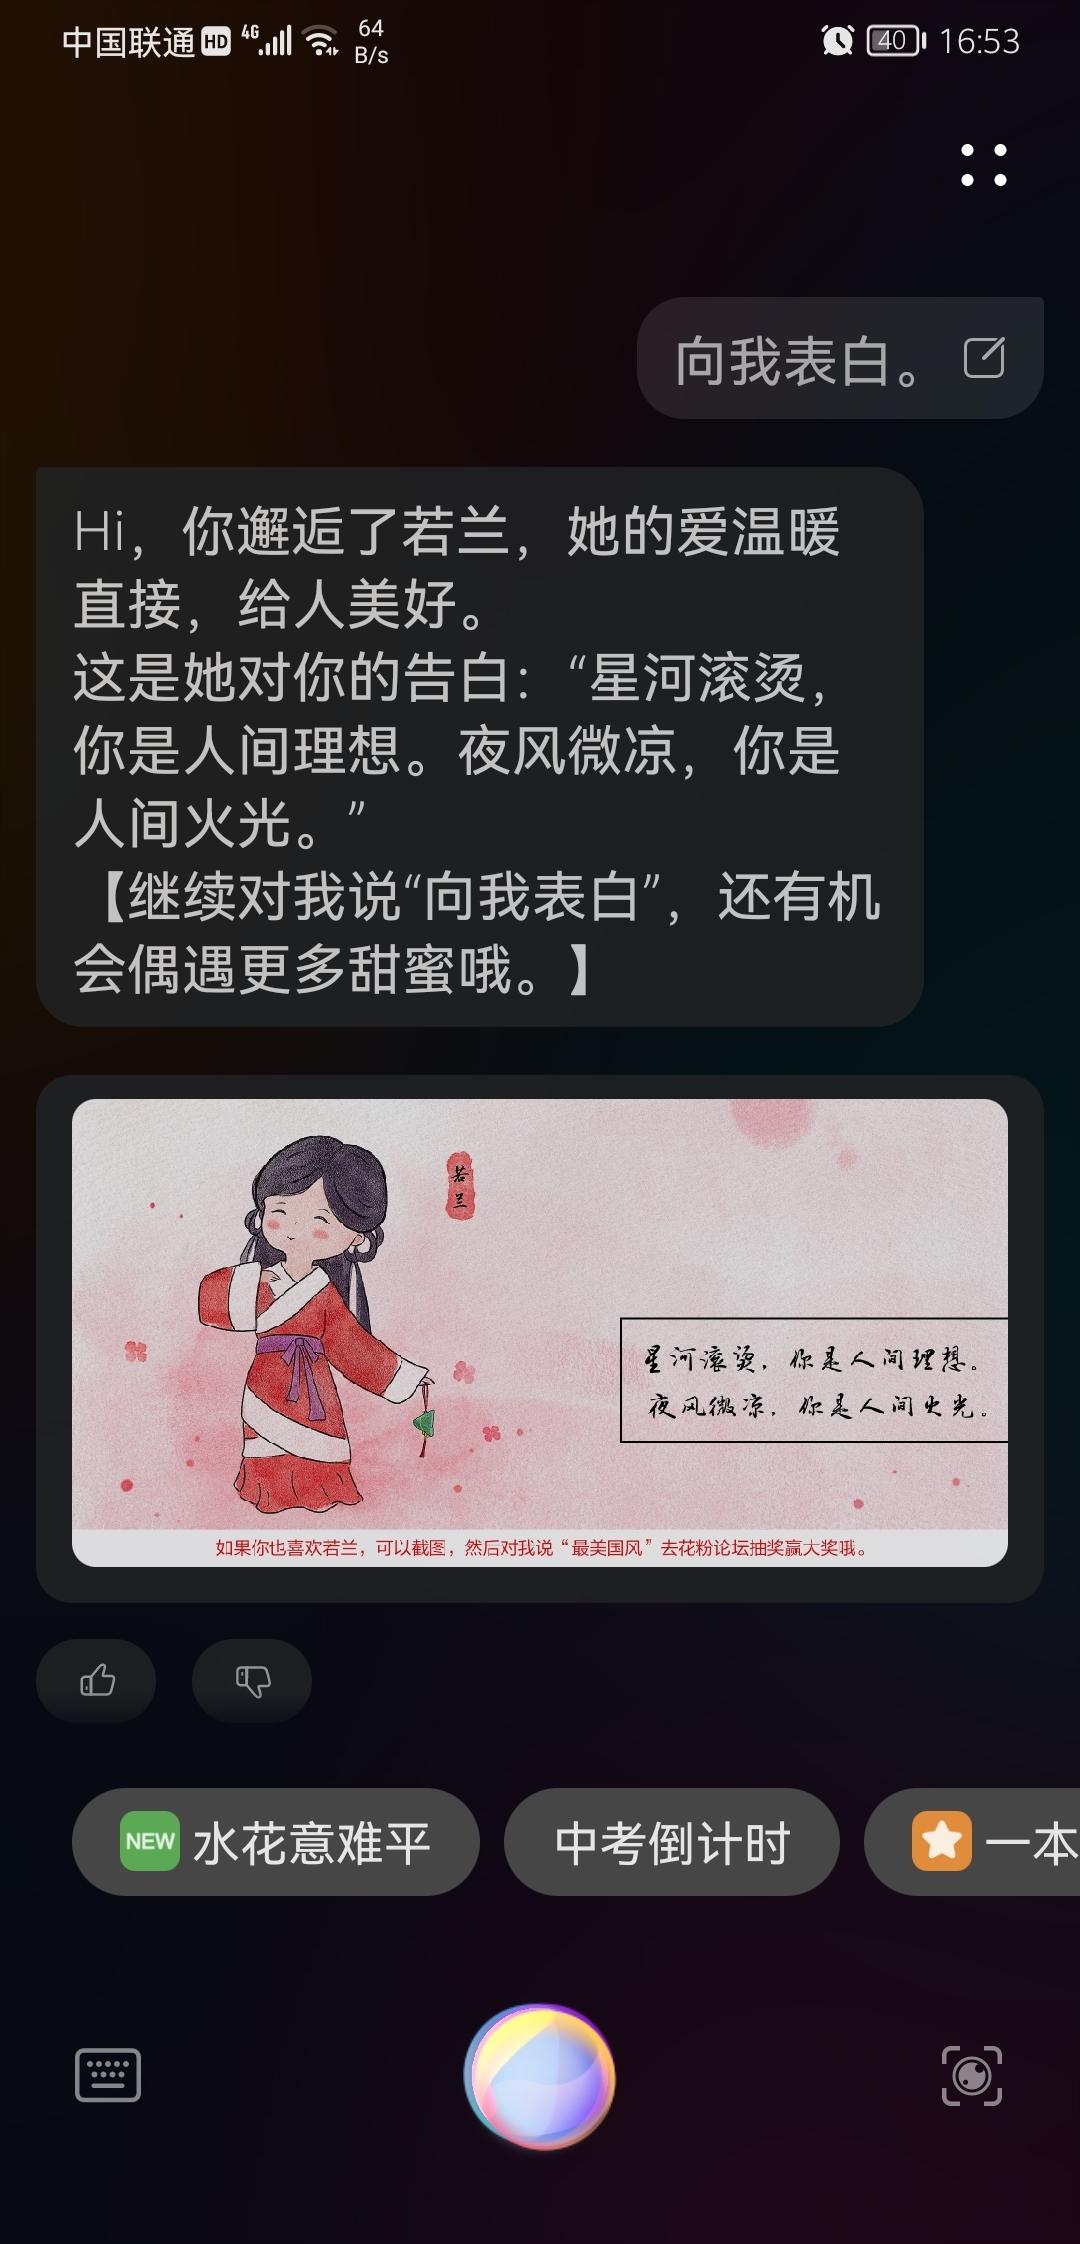 Screenshot_20210611_165344_com.huawei.vassistant.jpg